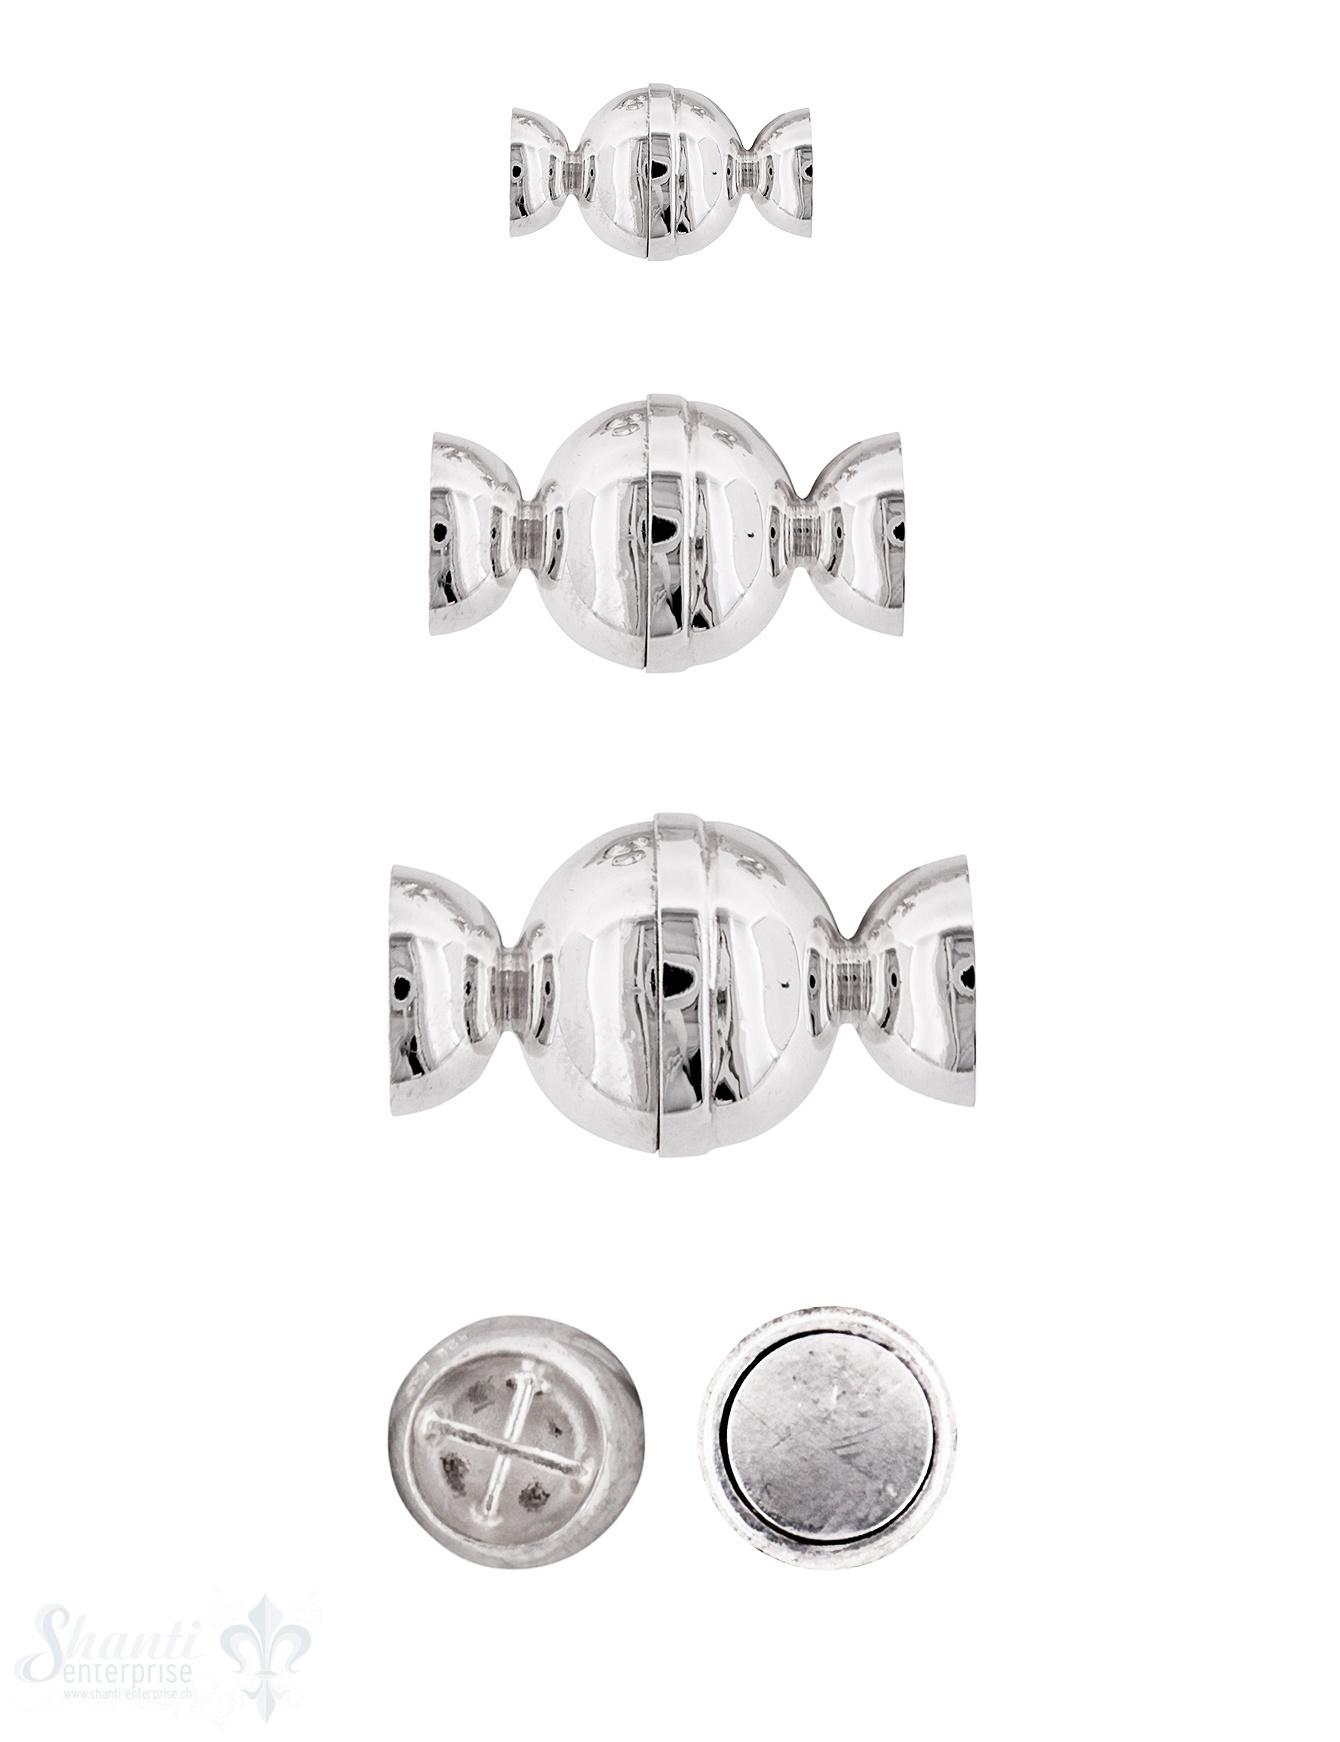 Silbermagnetschloss Kugel mit fixen Kappen 8-reihig tief gesetzt